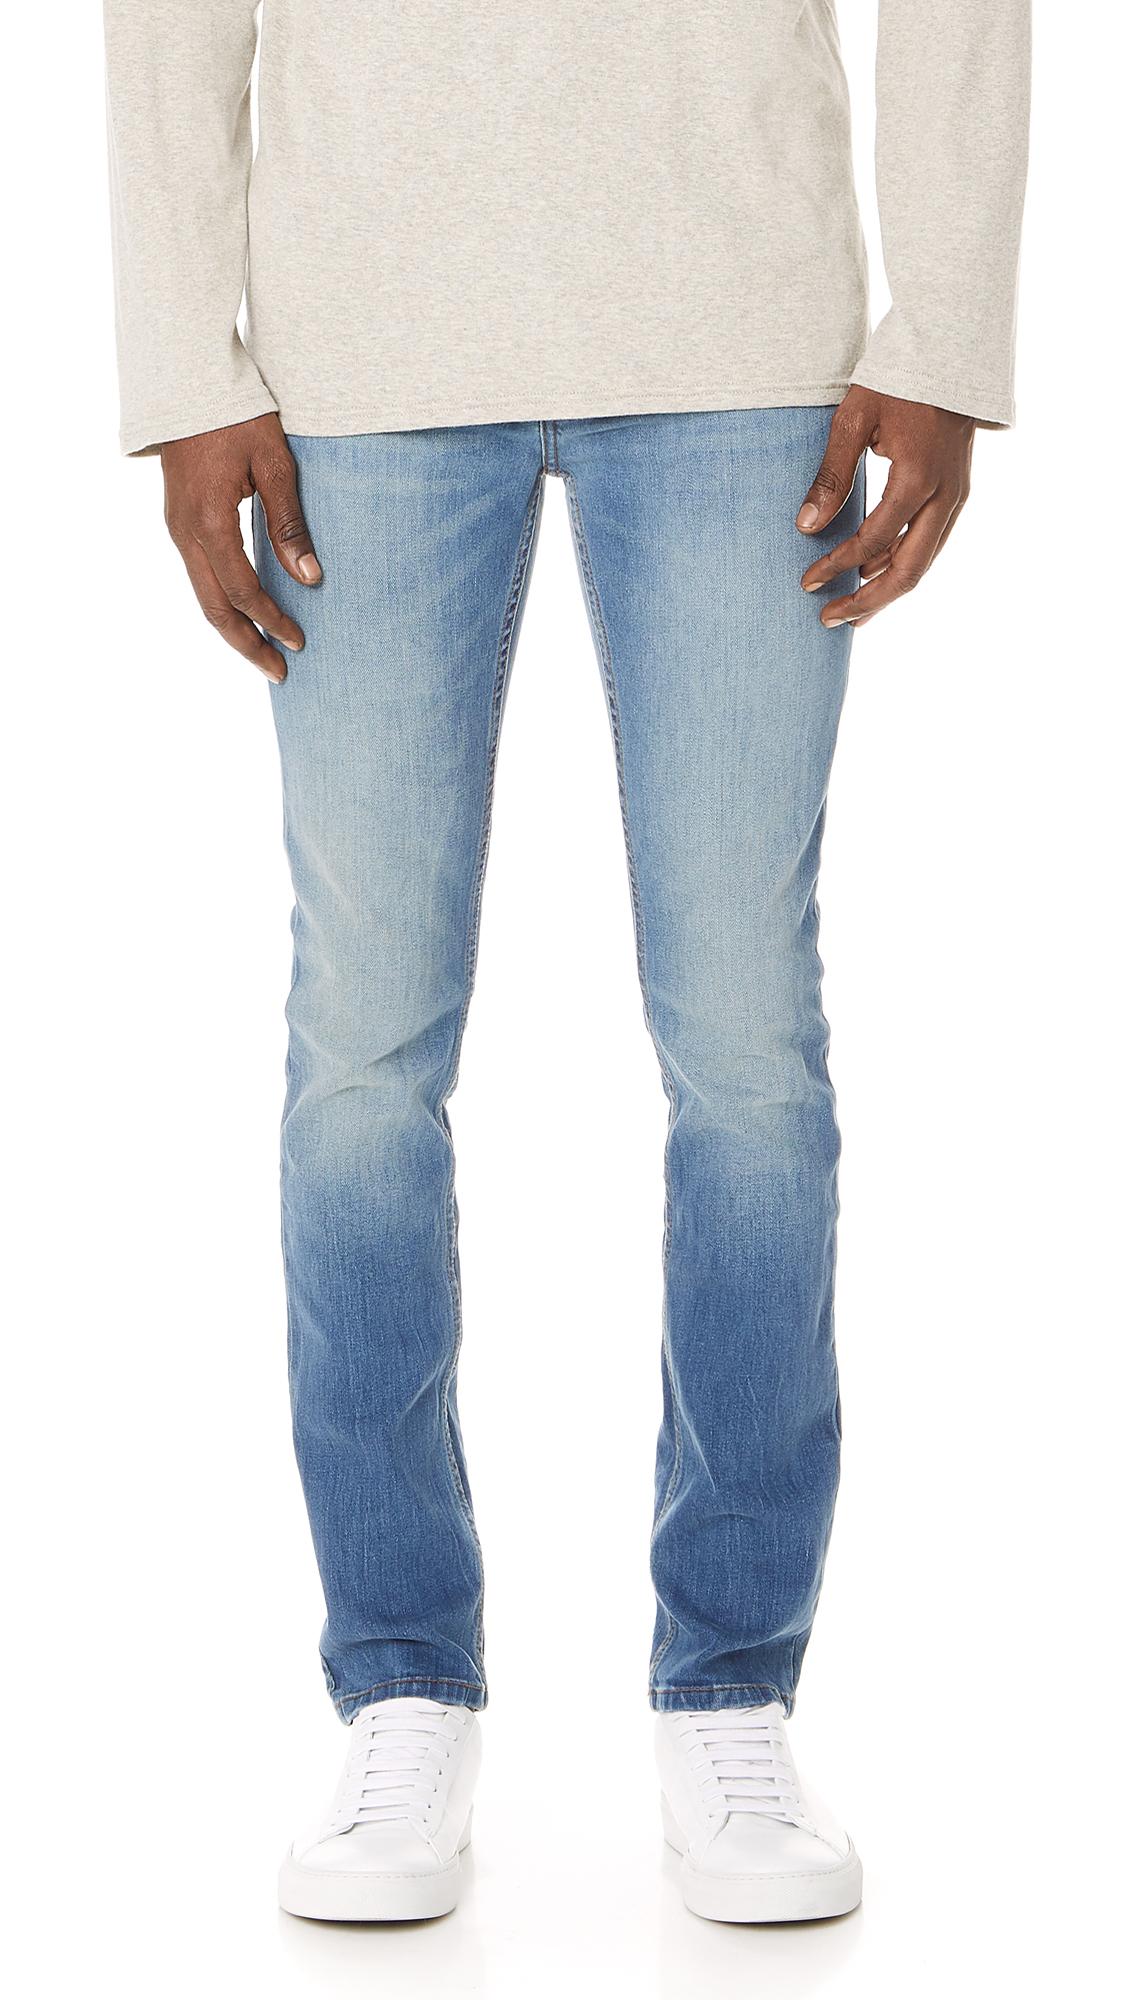 Mens skinny jeans 26 x 30